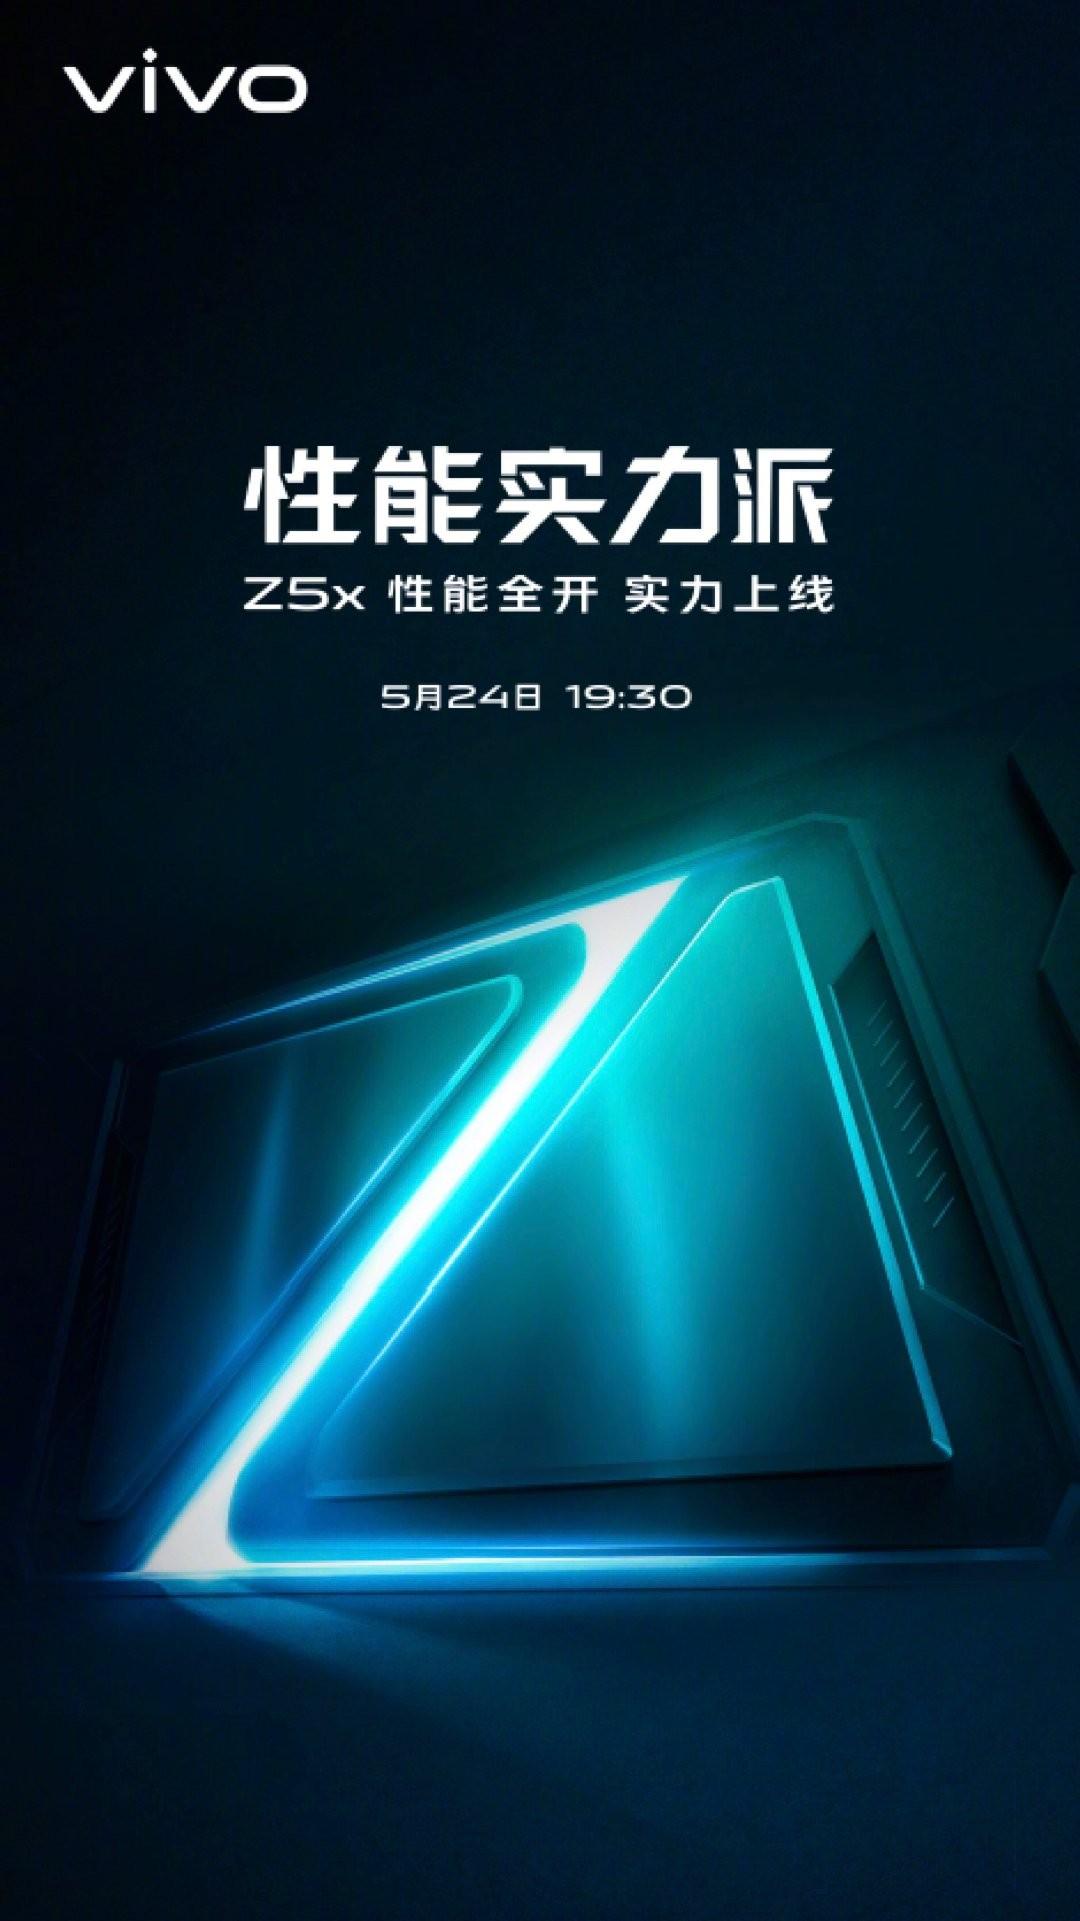 Vivo Z5x Official Poster